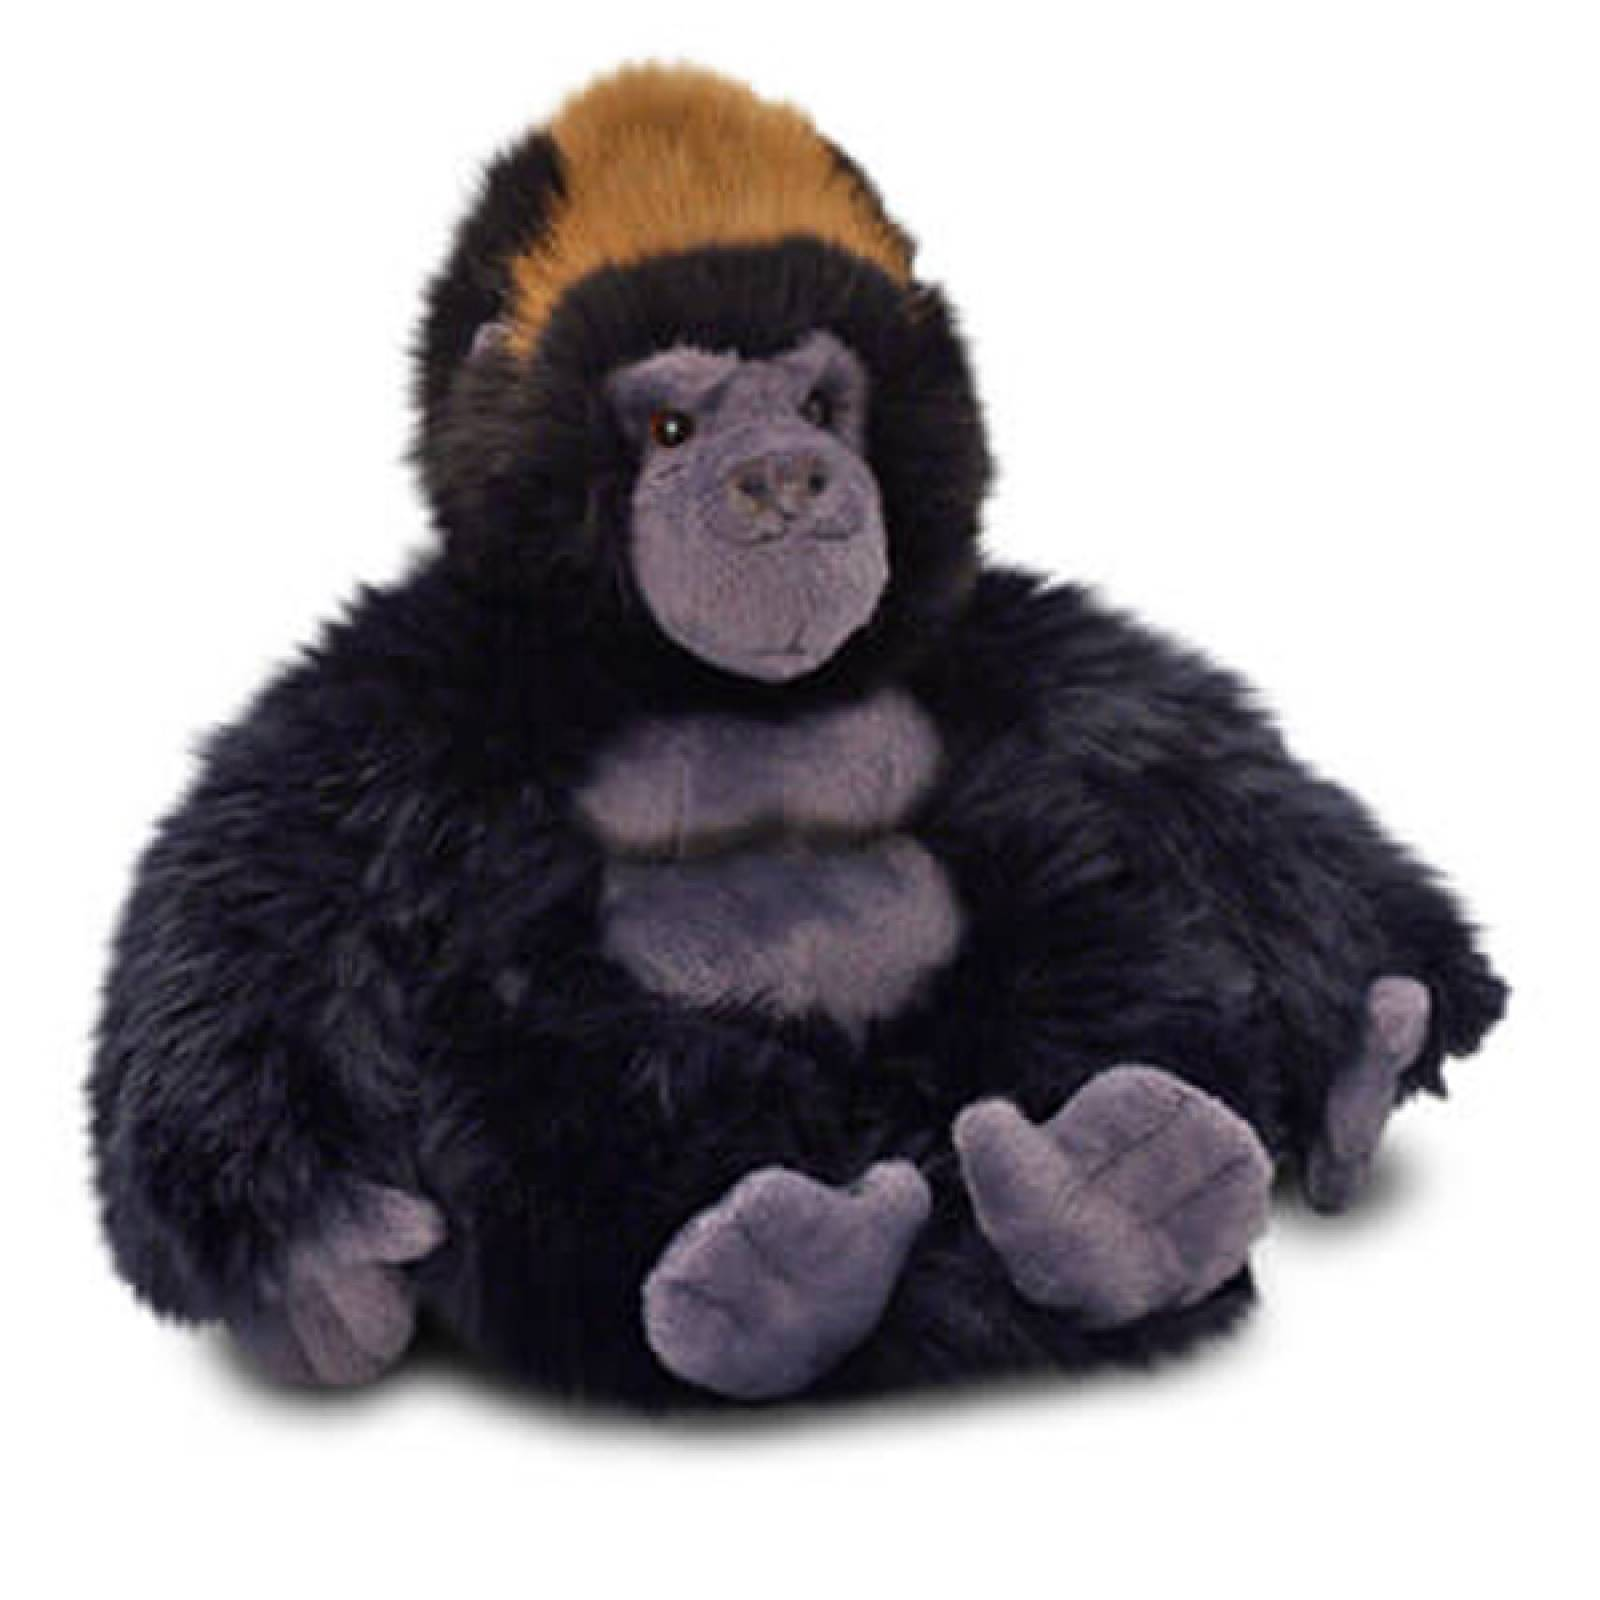 Sitting Gorilla Silverback Soft Toy 20cm